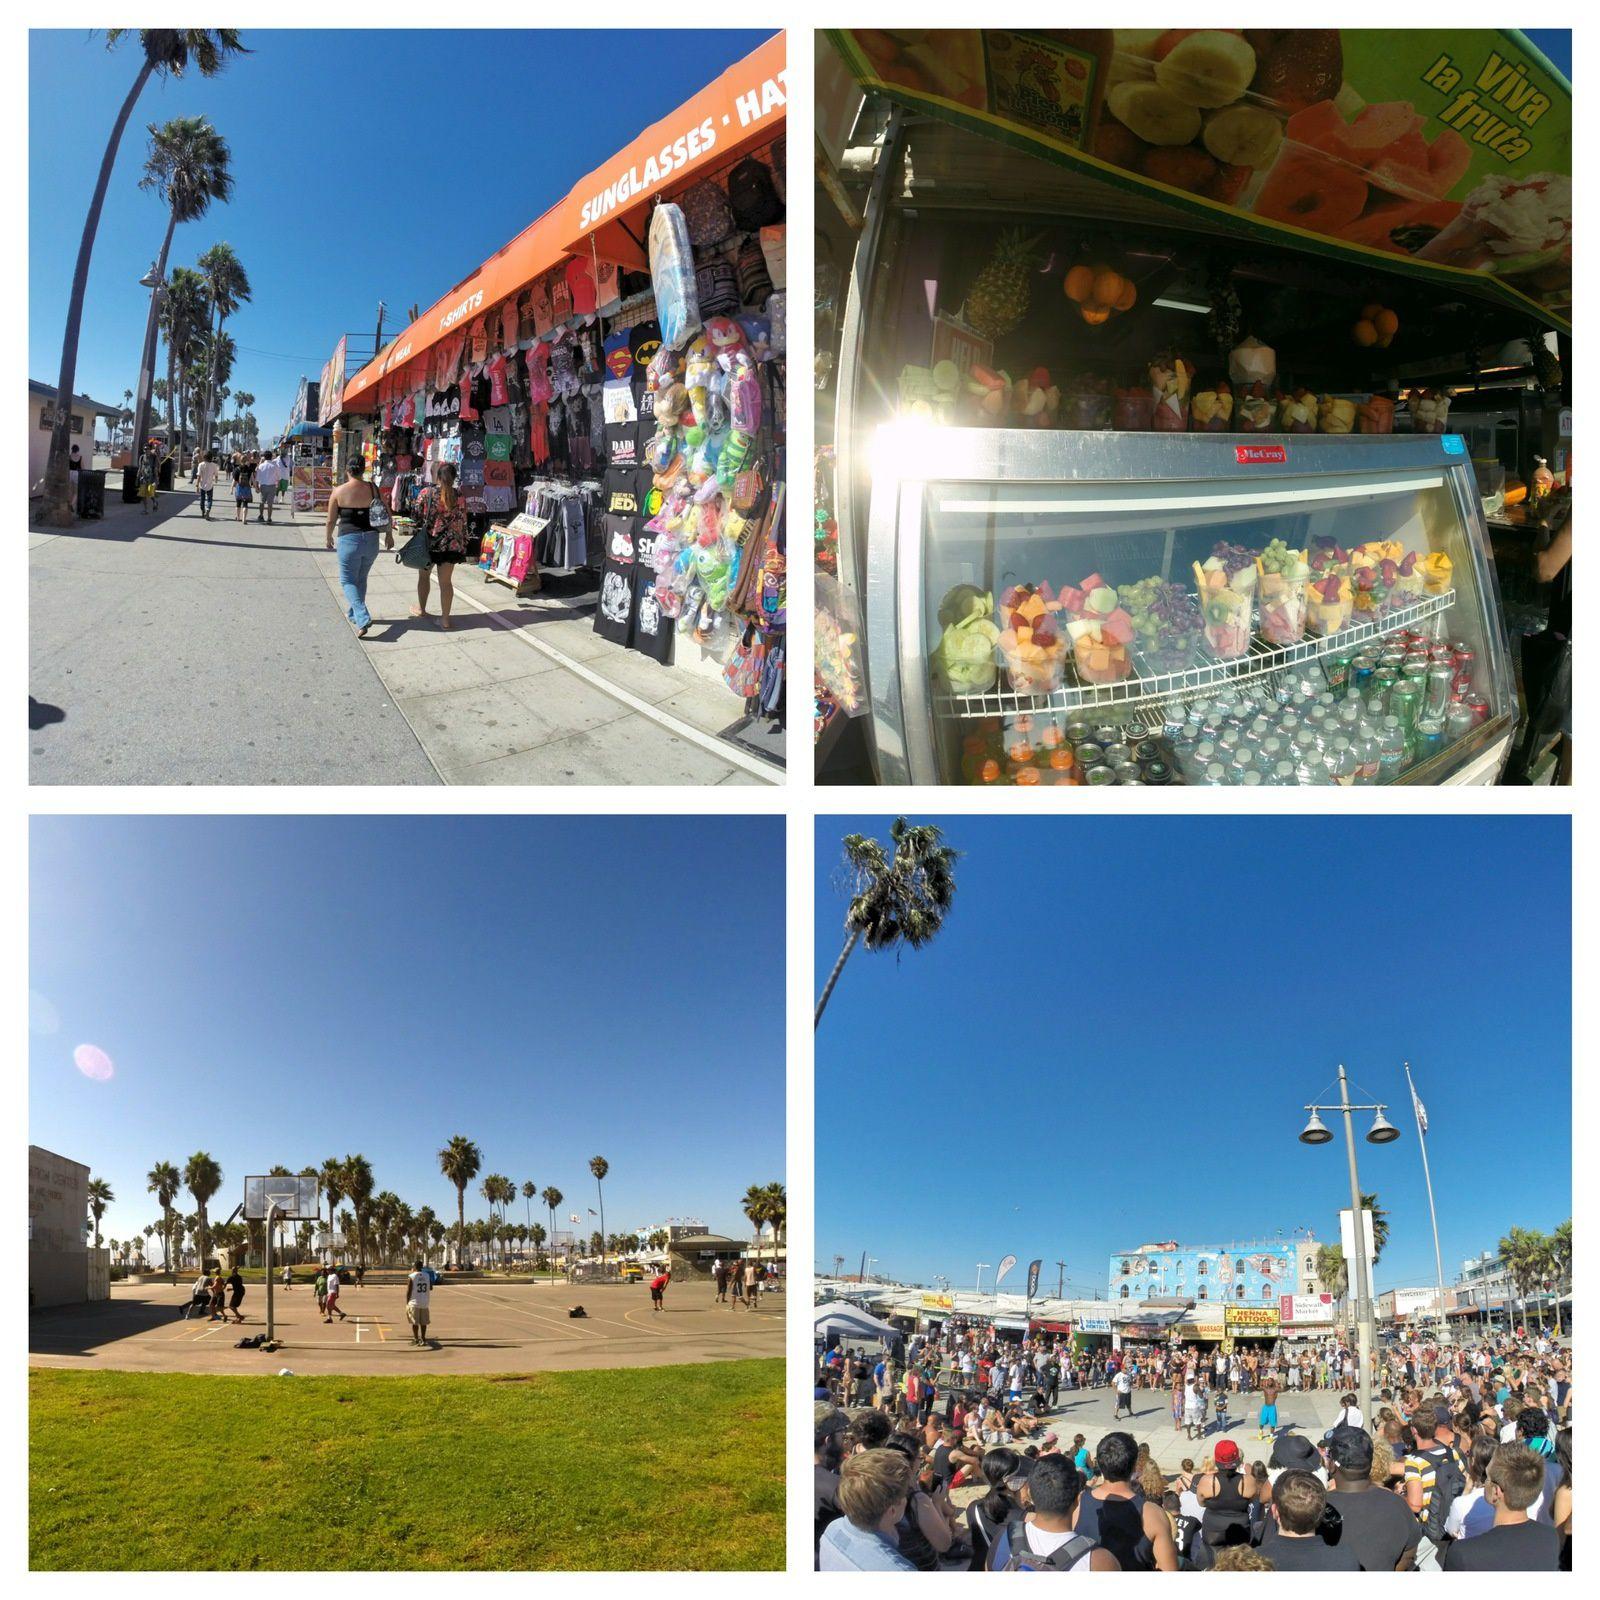 Los Angeles - Day 5 &amp&#x3B; 6